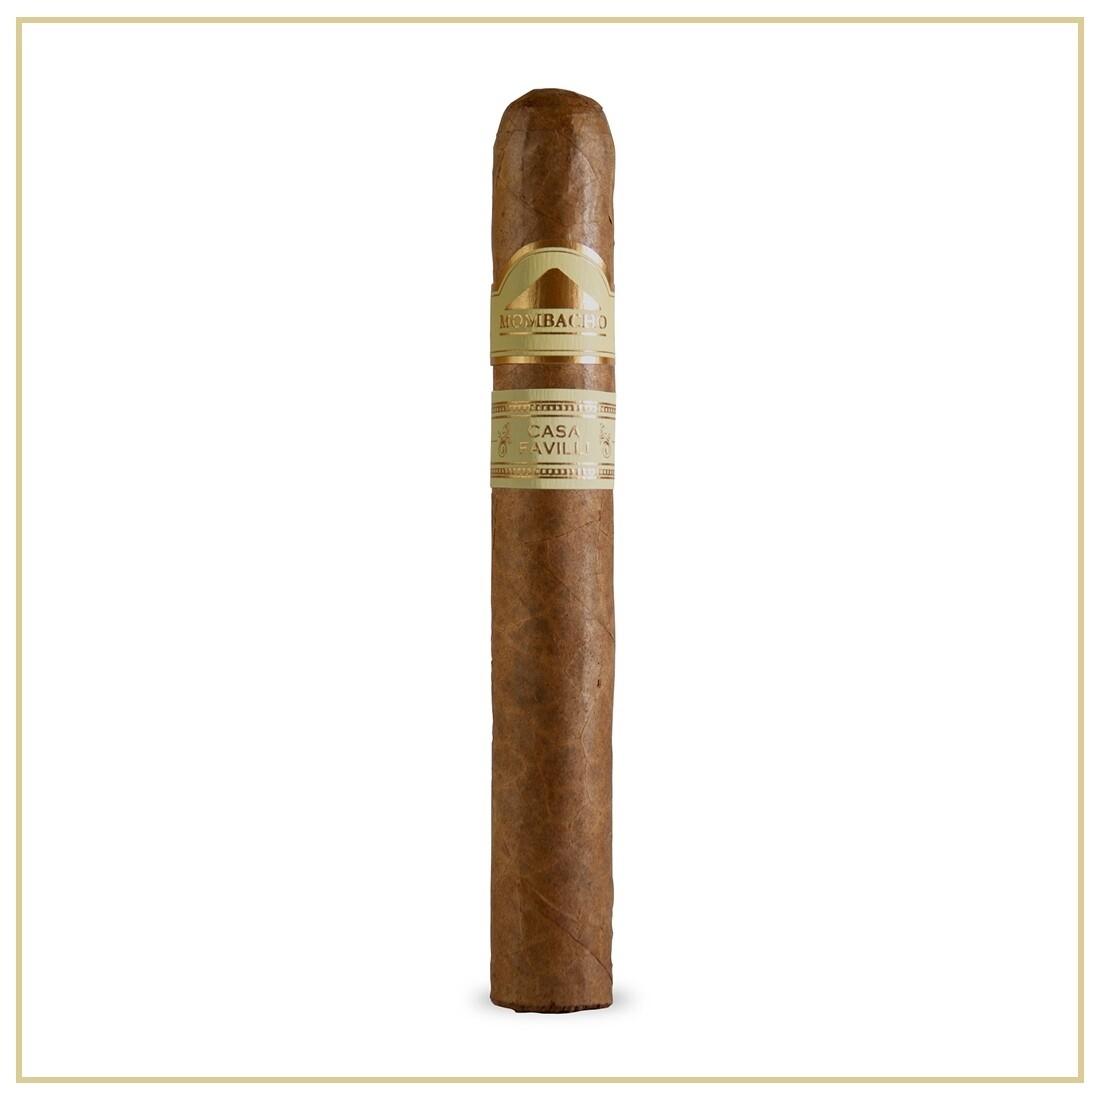 Mombacho Casa Favilli Toro 6 x 52 Single Cigar